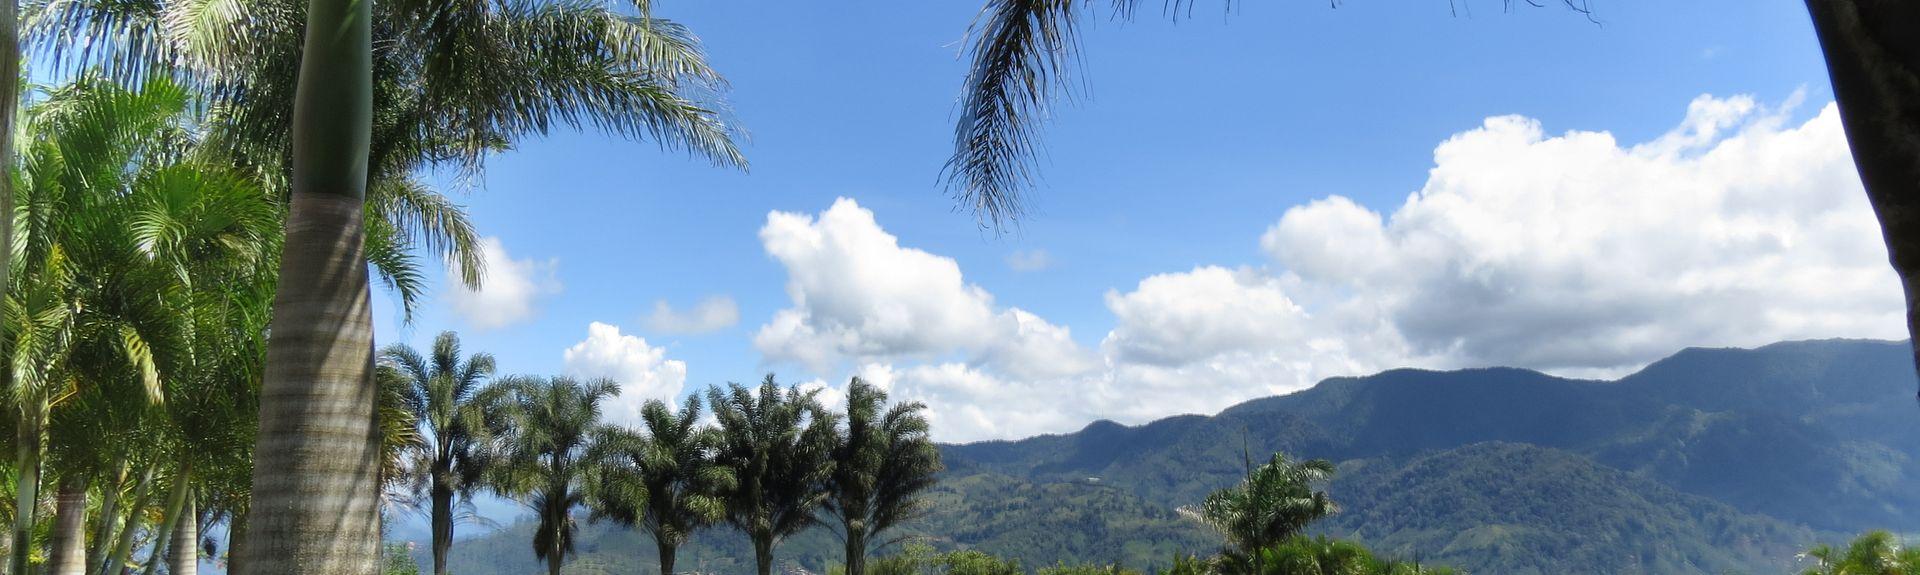 Cartago, Cartago, Costa Rica